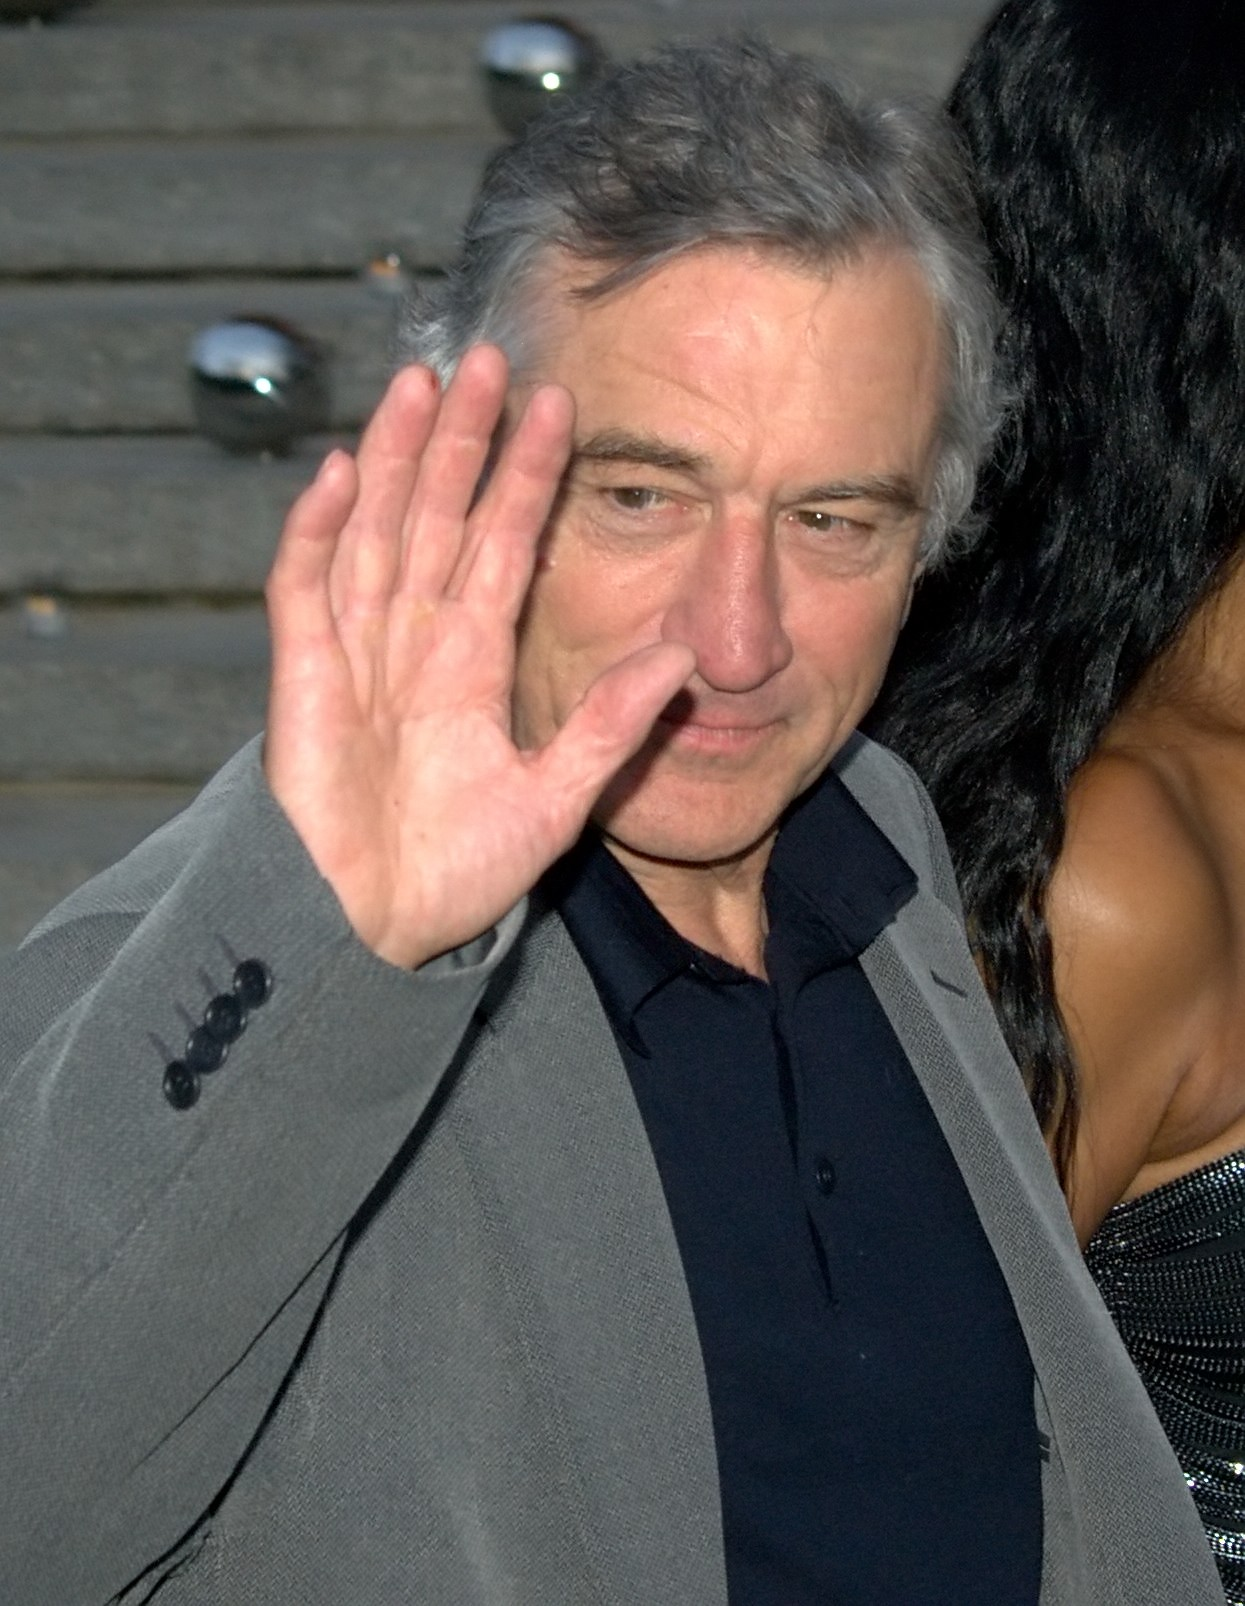 File:Robert De Niro Wa...